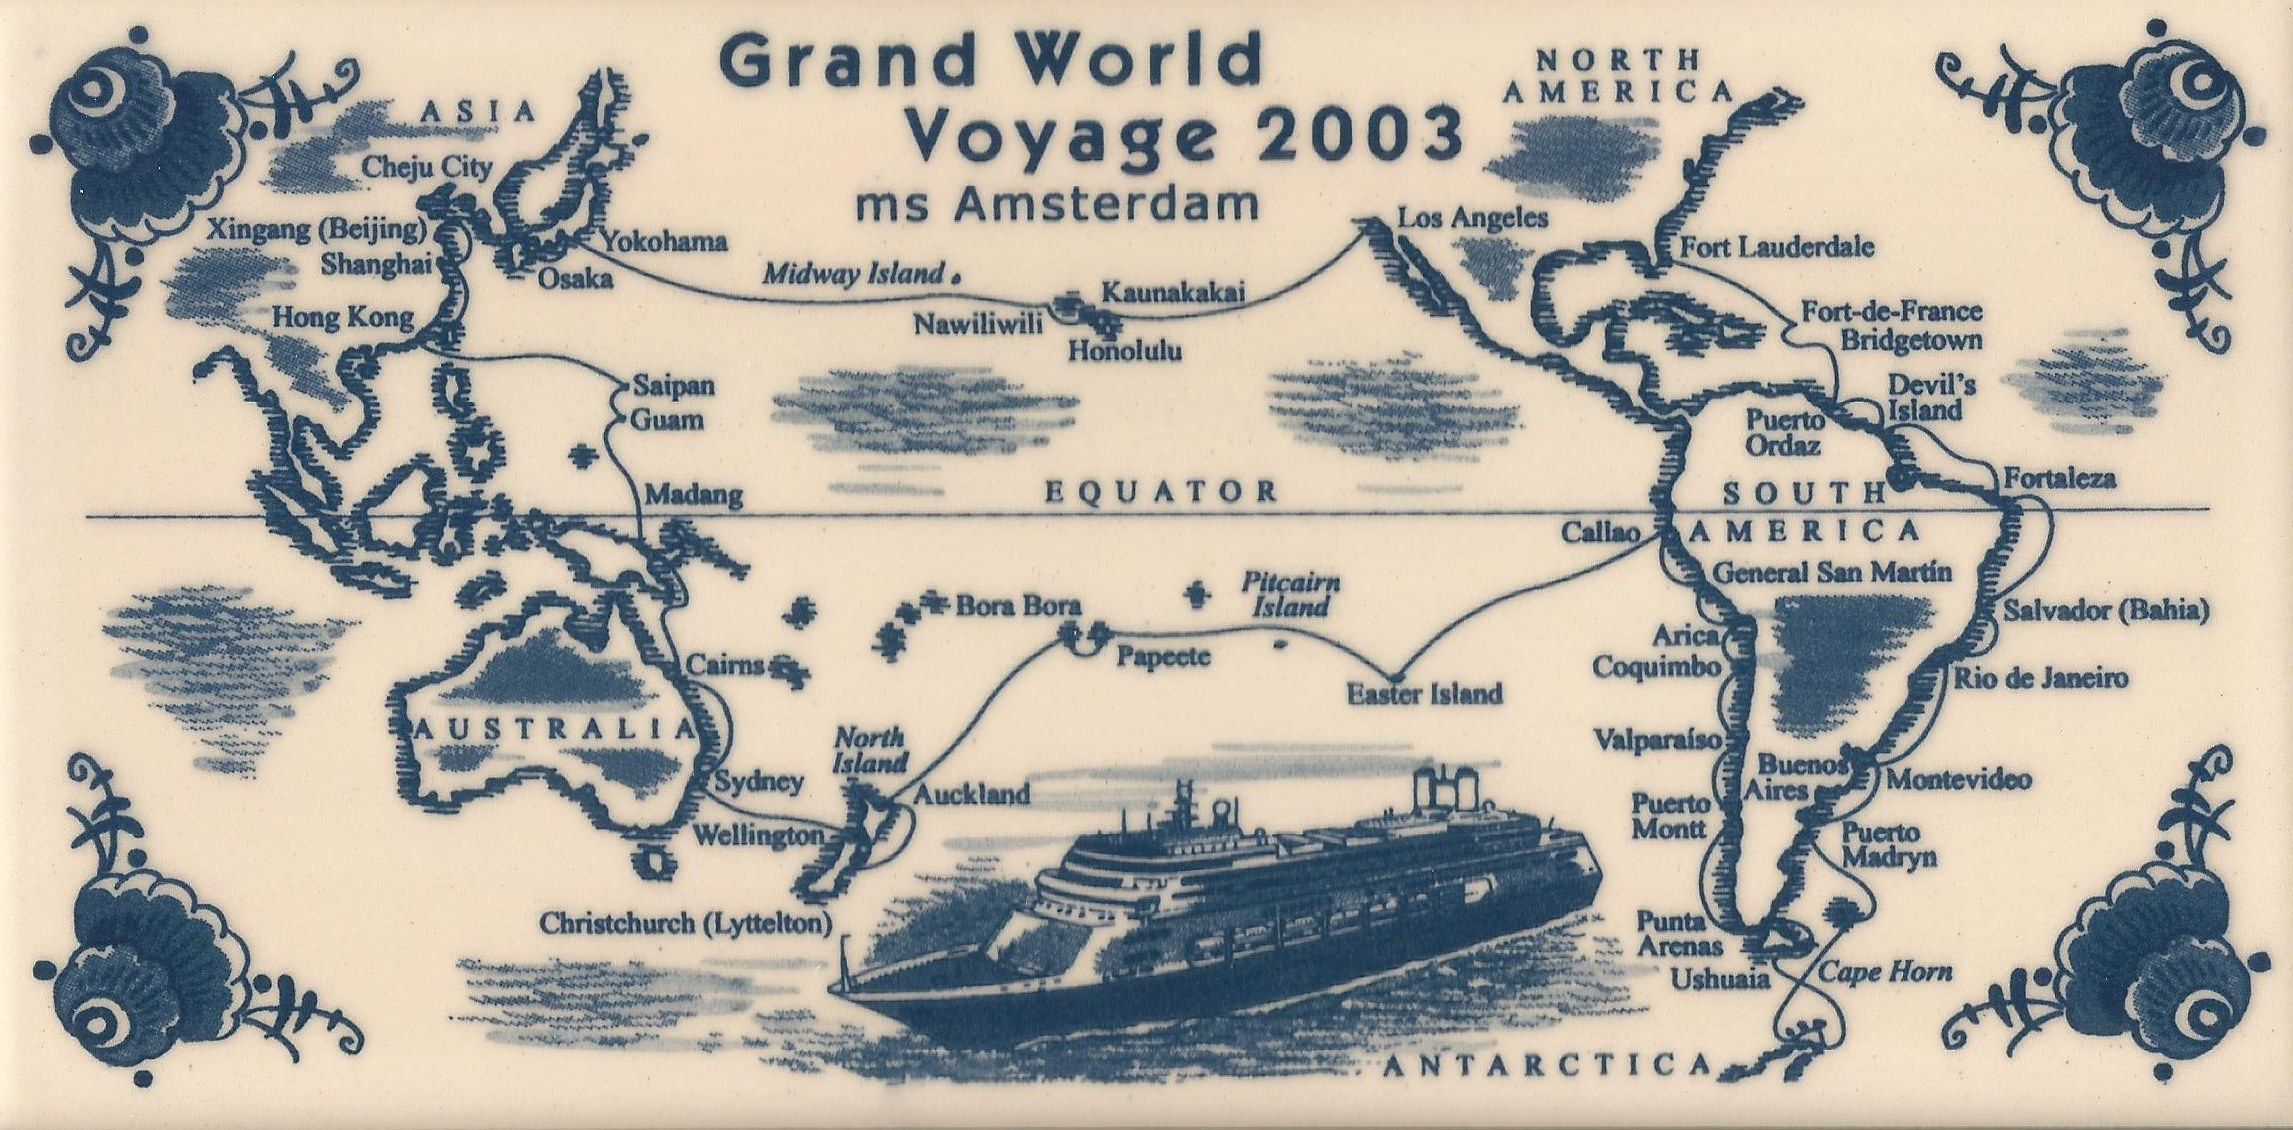 Holland America World Cruise 2003